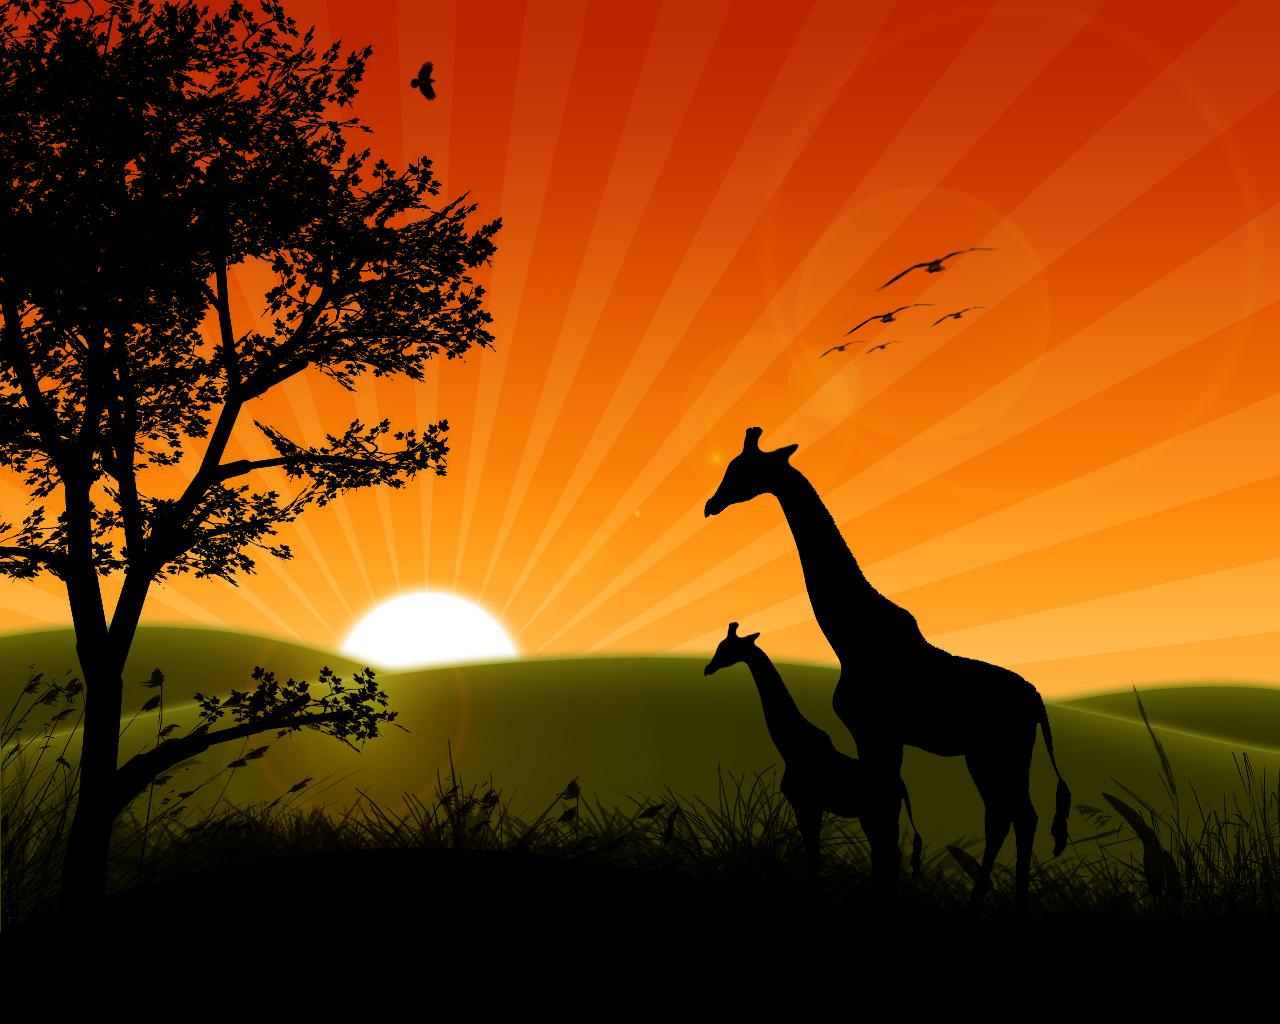 sunrise wallpaper 1280x1024